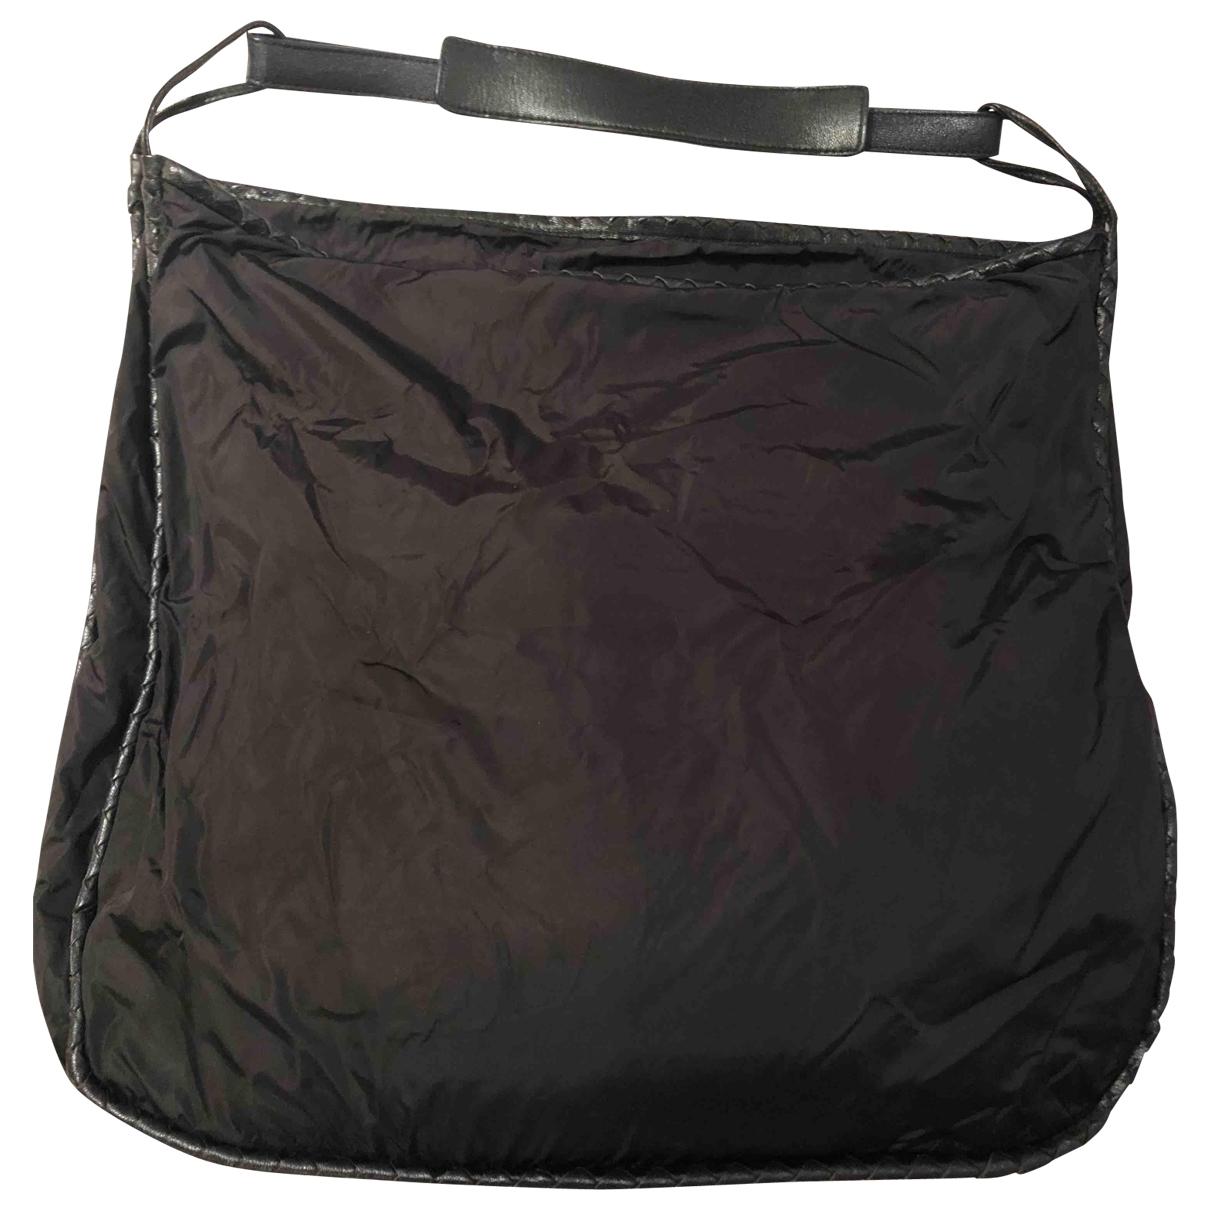 Bottega Veneta \N Black Cloth handbag for Women \N